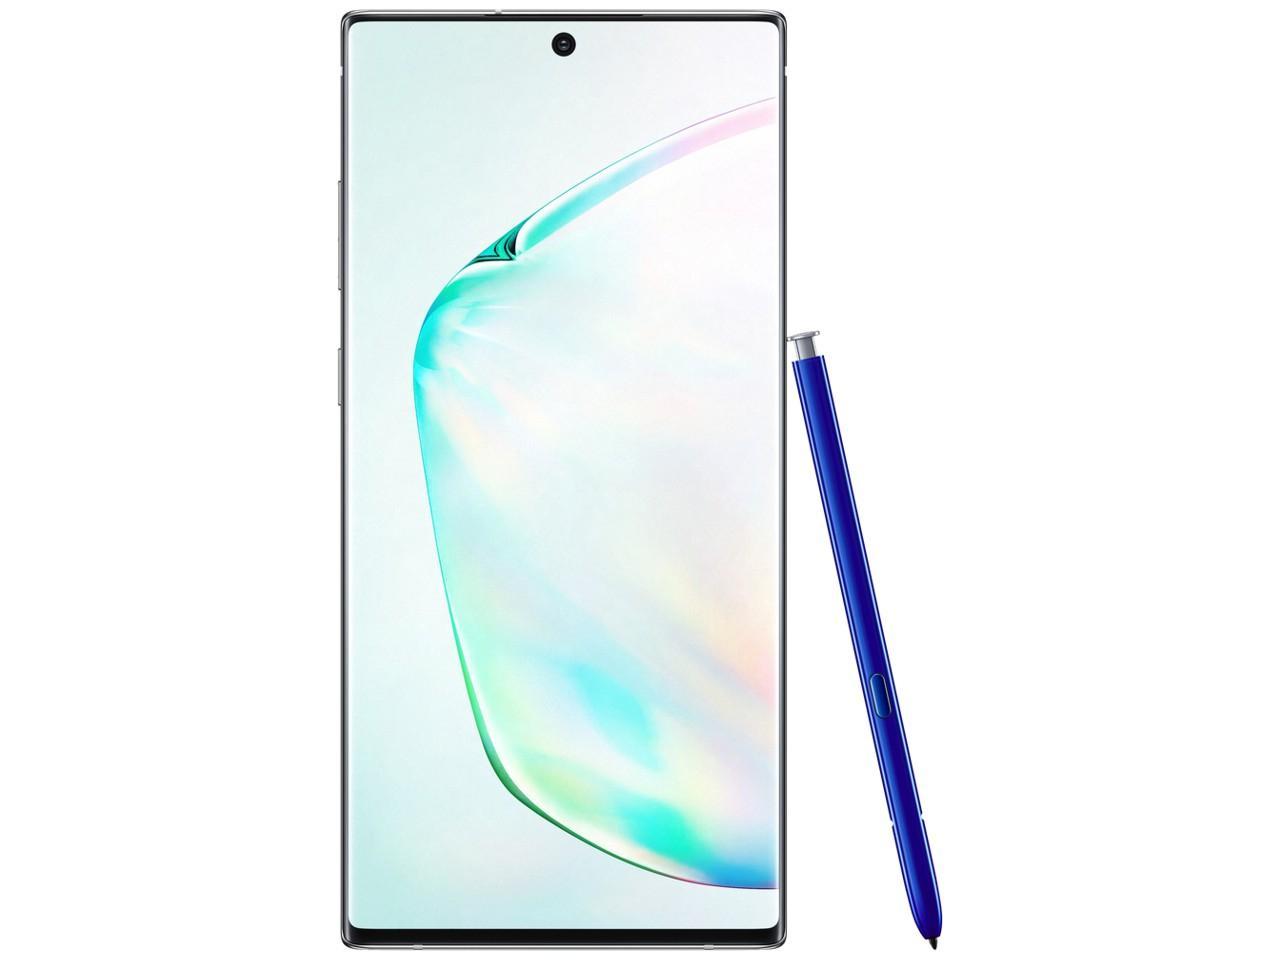 SAMSUNG Galaxy Note 10 (SM-N970F), 8GB/256GB, Dual SIM, stříbrný, CZ distribuce